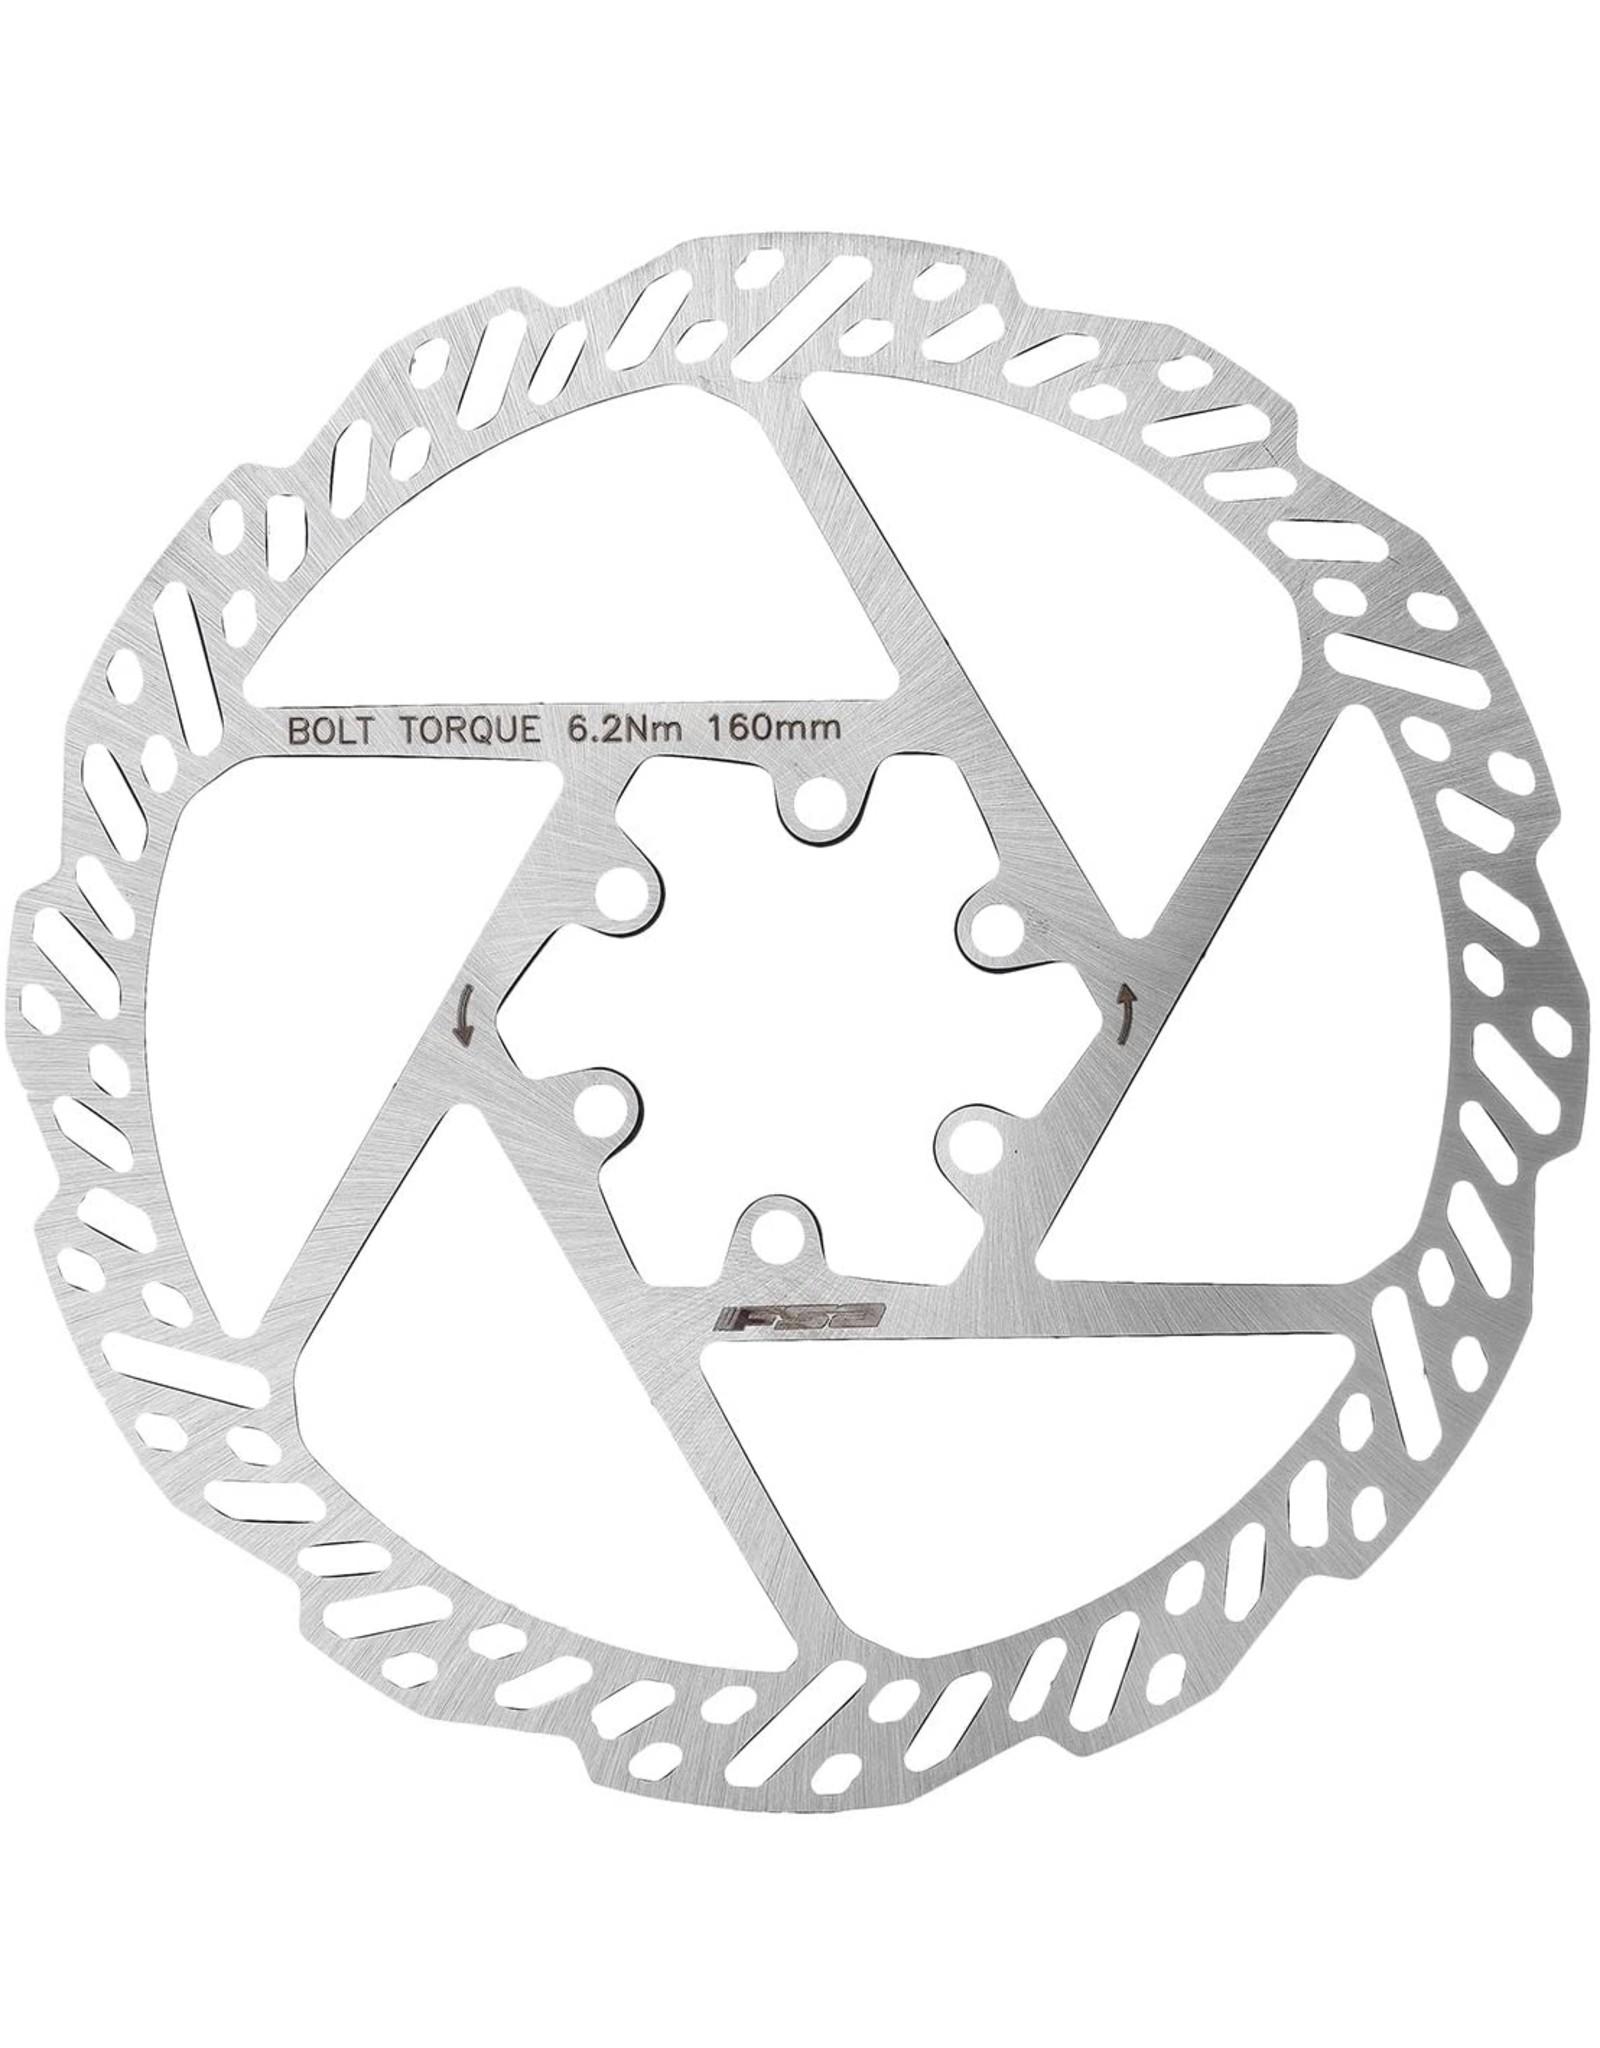 FSA K-Force 1-piece Disc Brake Rotor - 160mm